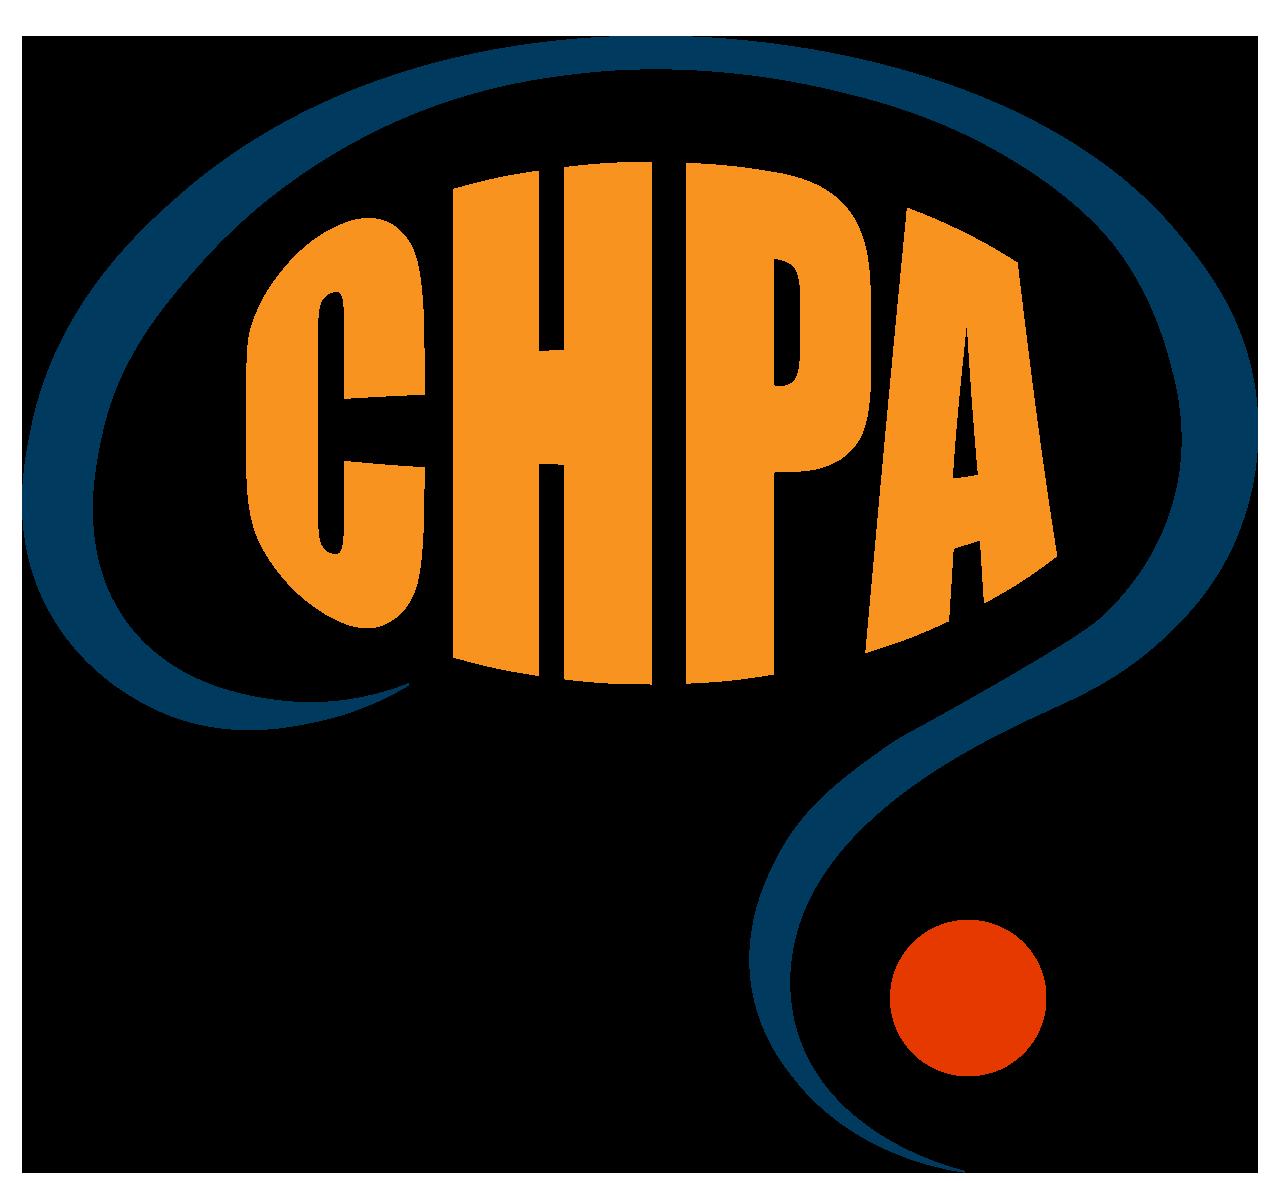 Honest clipart academic honesty. General information cedar hill